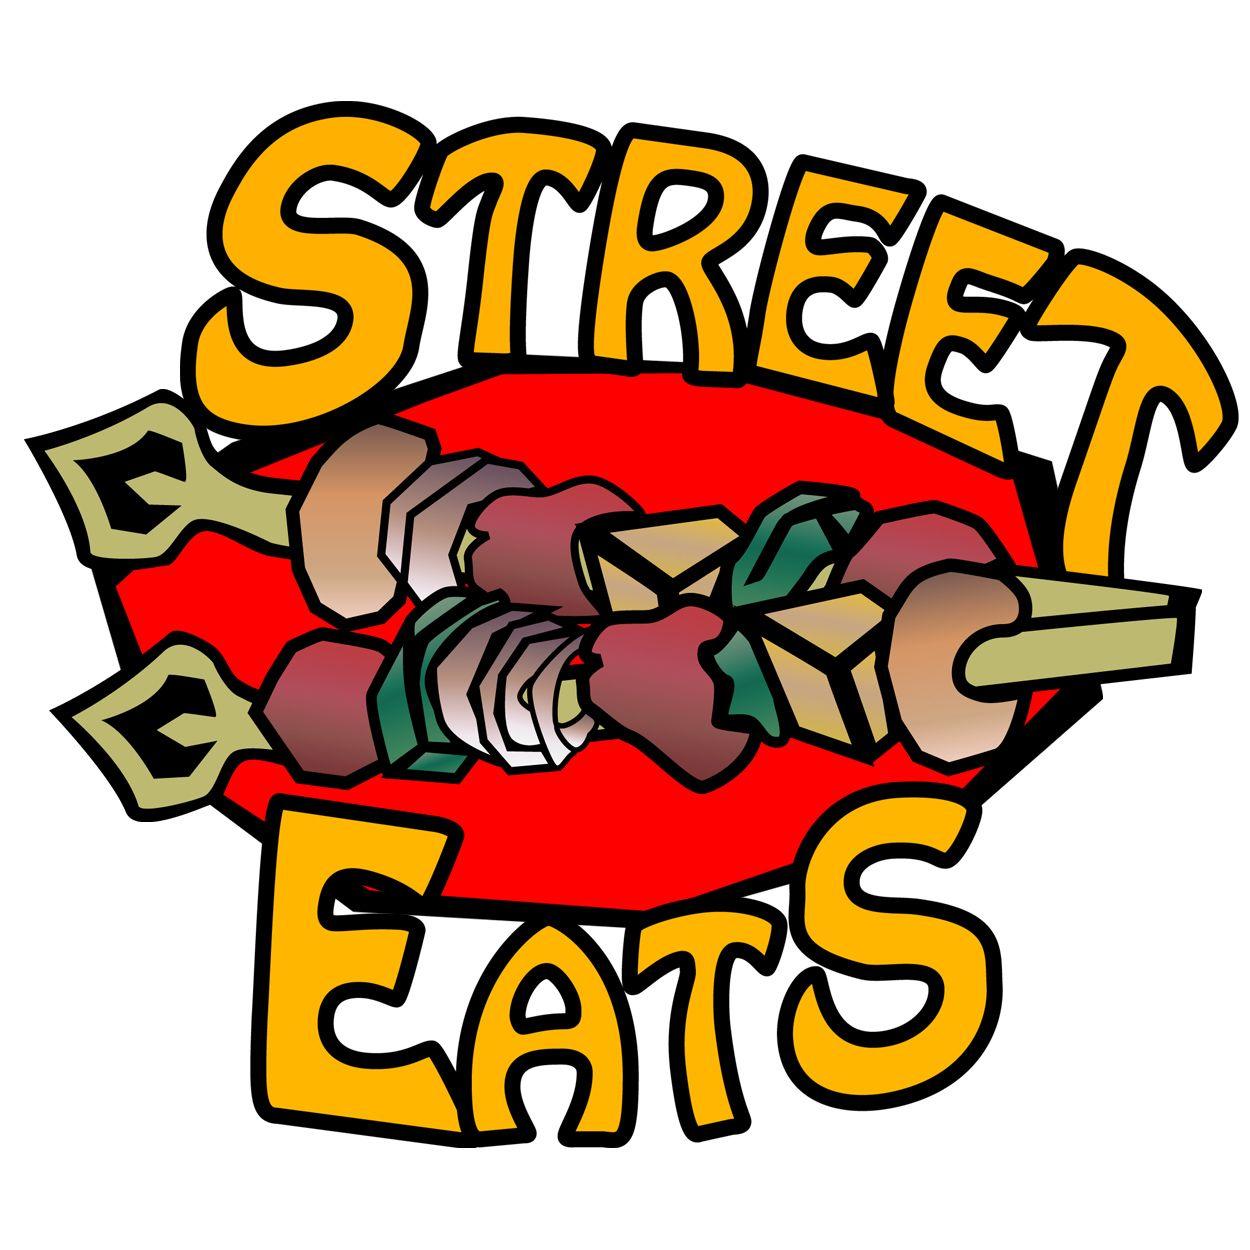 Street Eats. Marketing concept. Food crawl, Best food